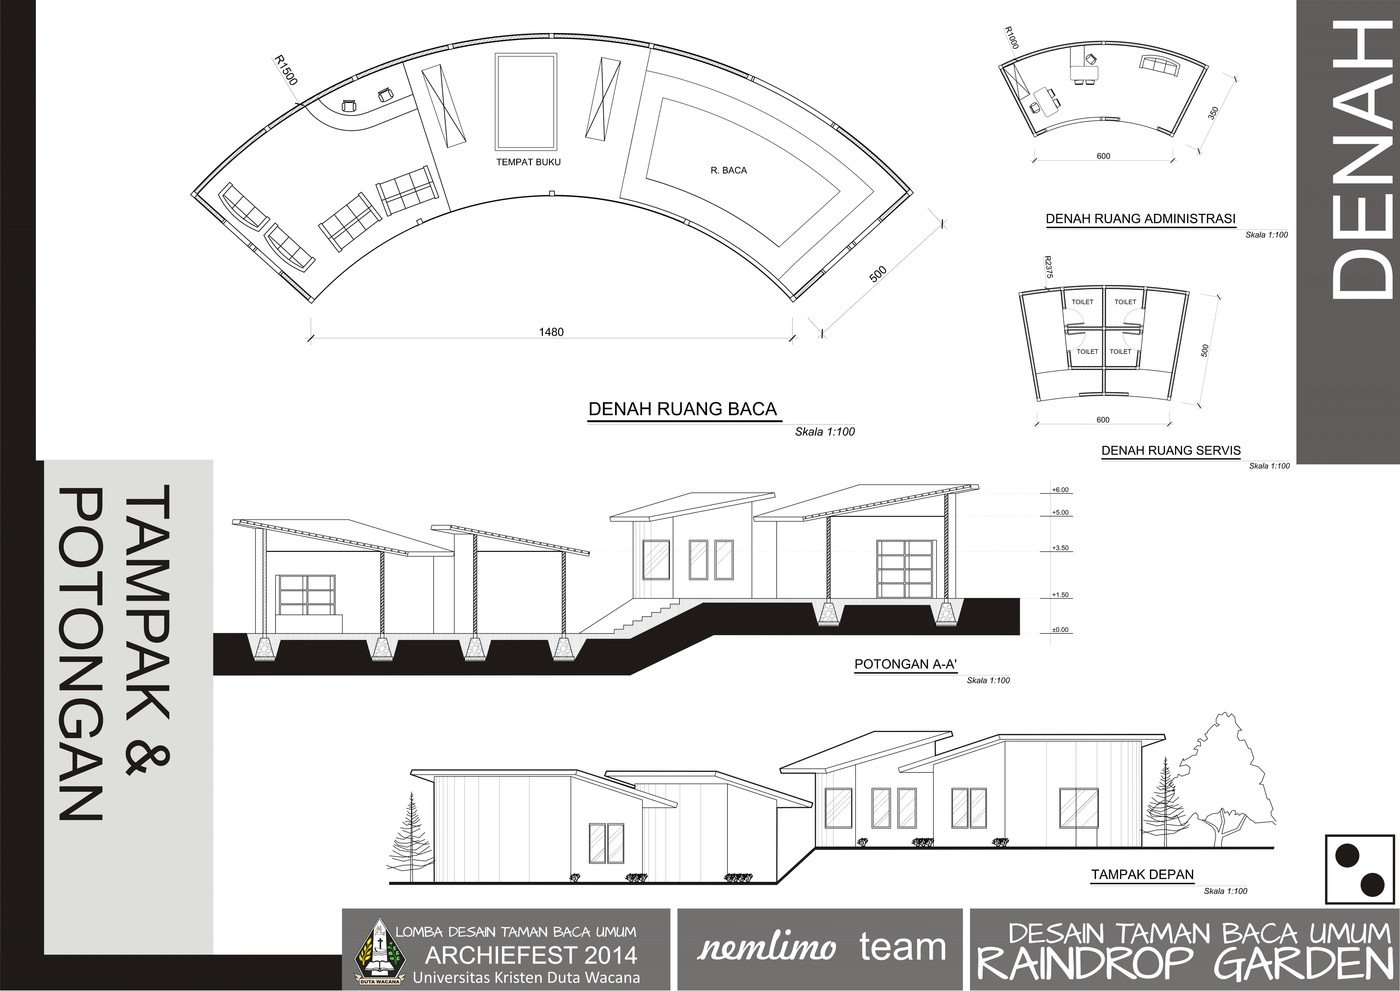 Archiefest 2014 Desain Taman Baca Umum By Rizal Ardy Firmansyah At  Coroflot.com